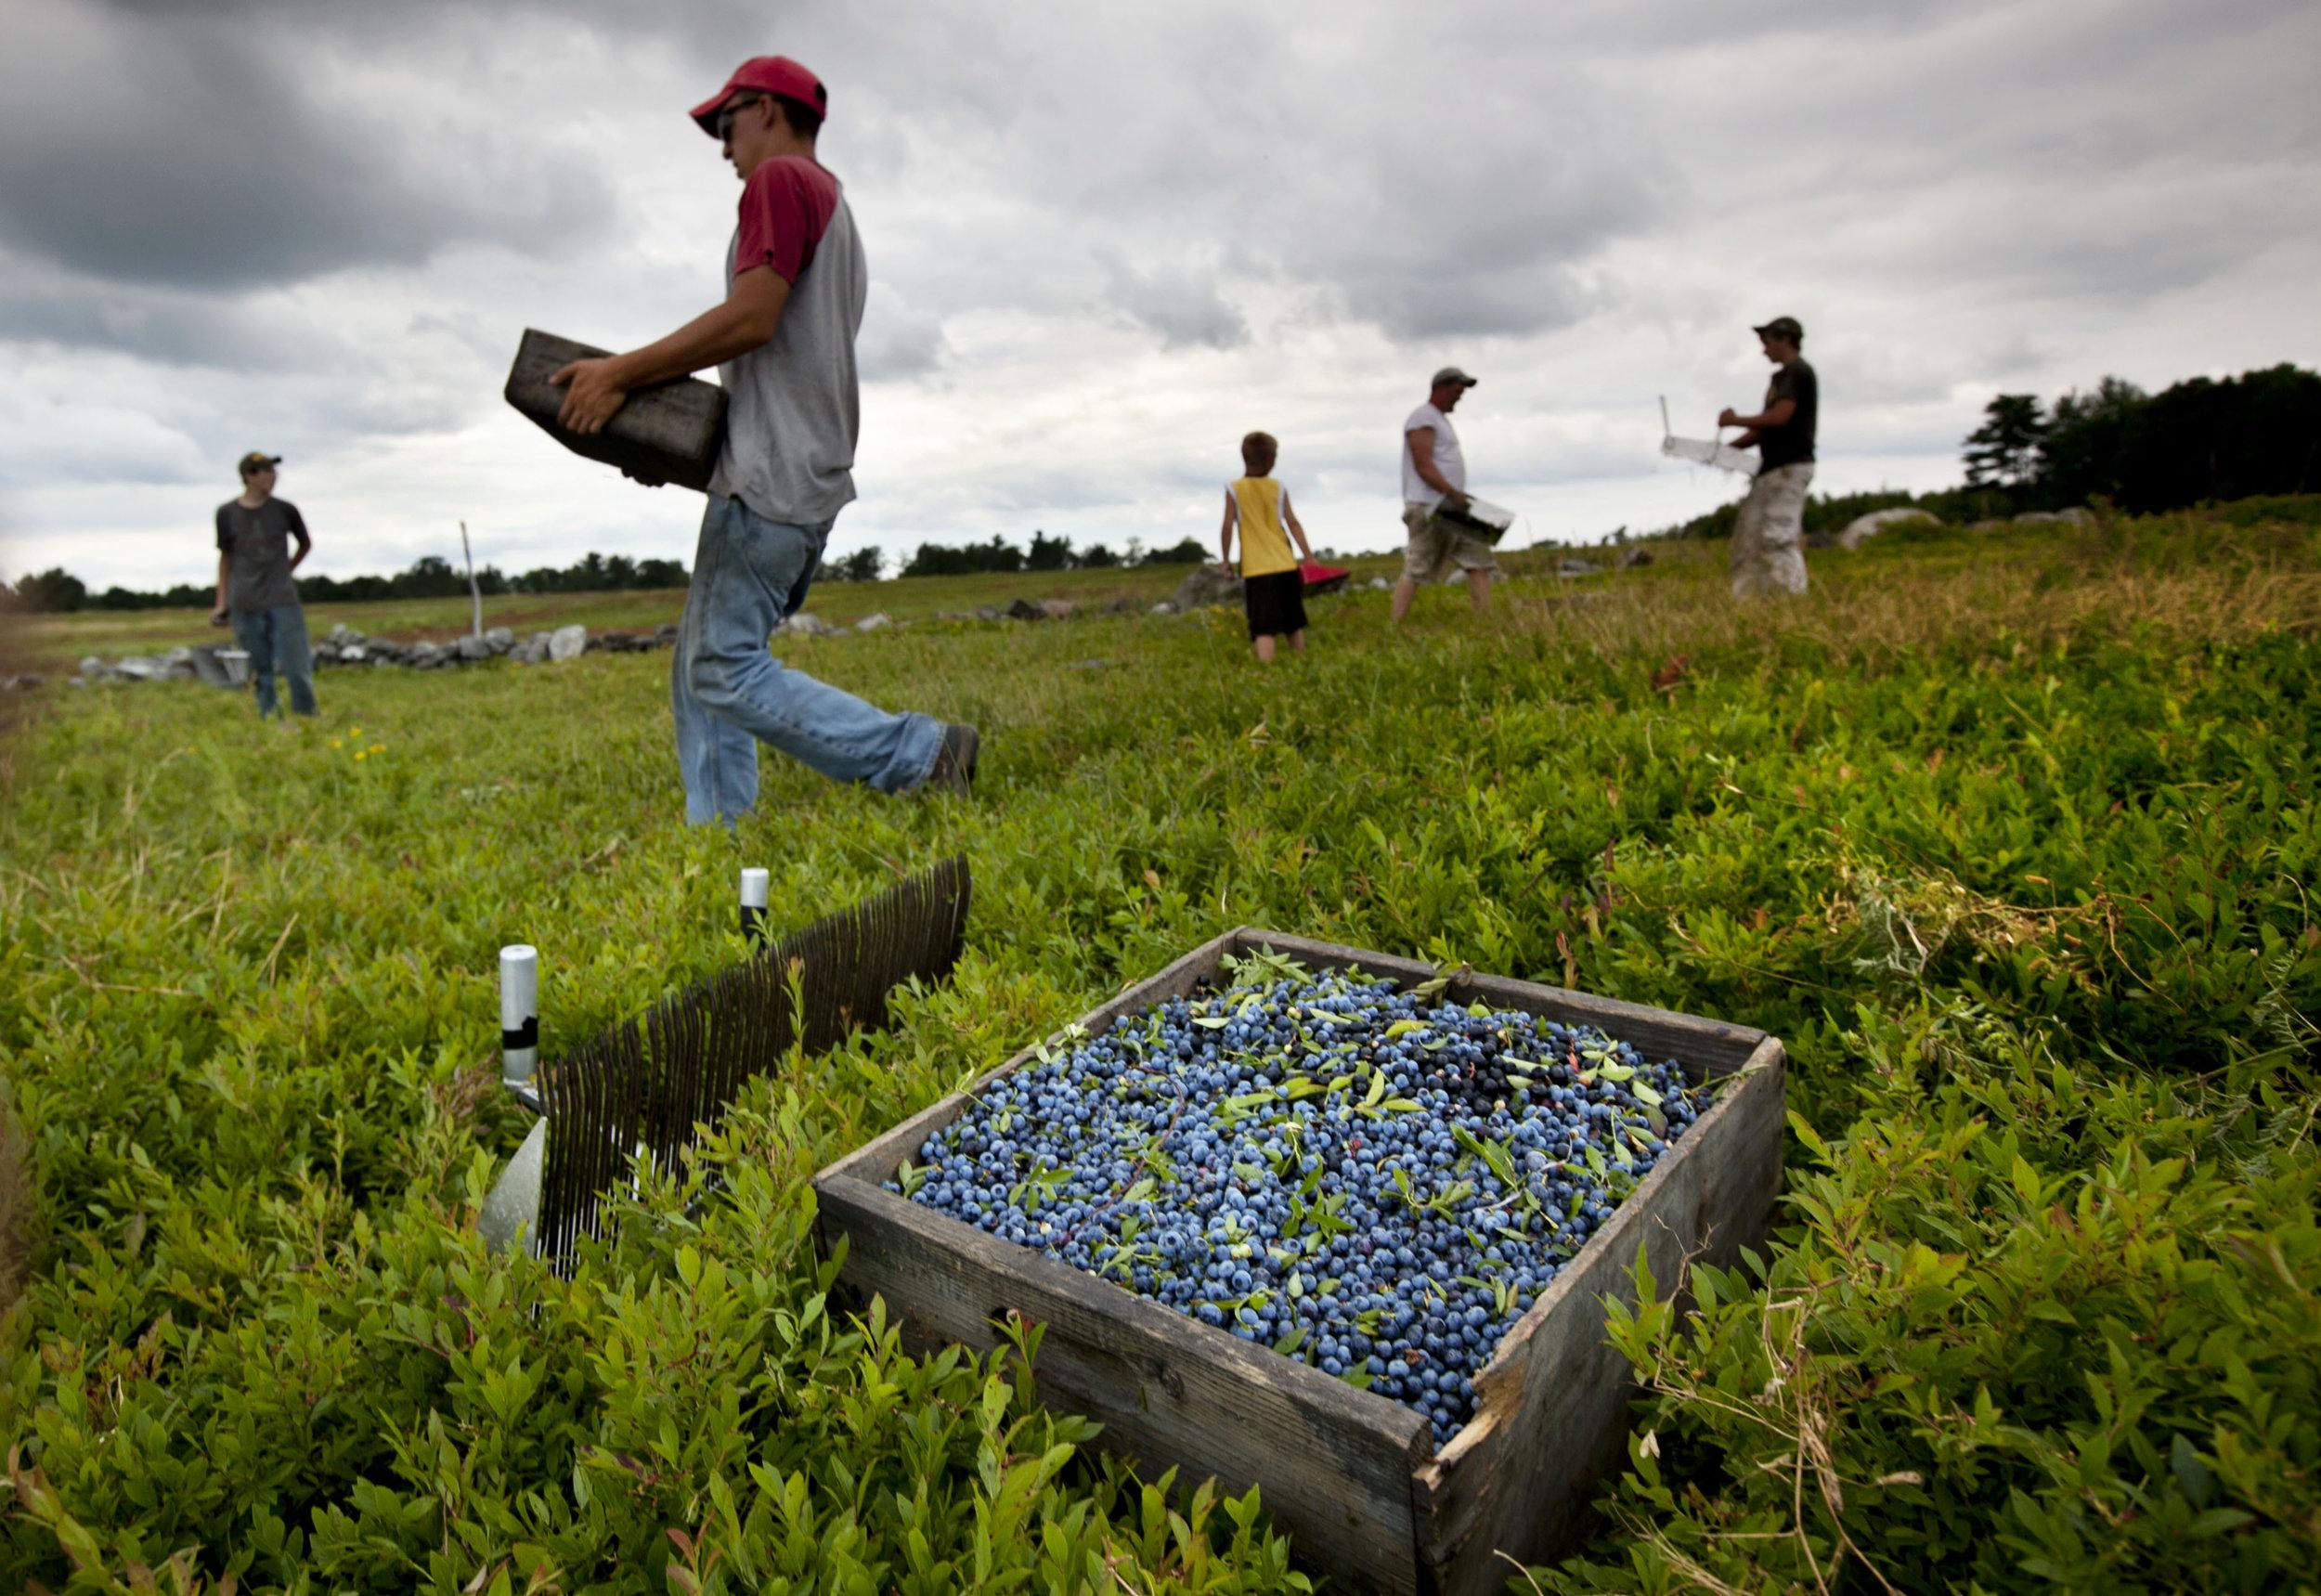 Farmworkers harvest blueberries. AP Photo/Robert F. Bukaty, File